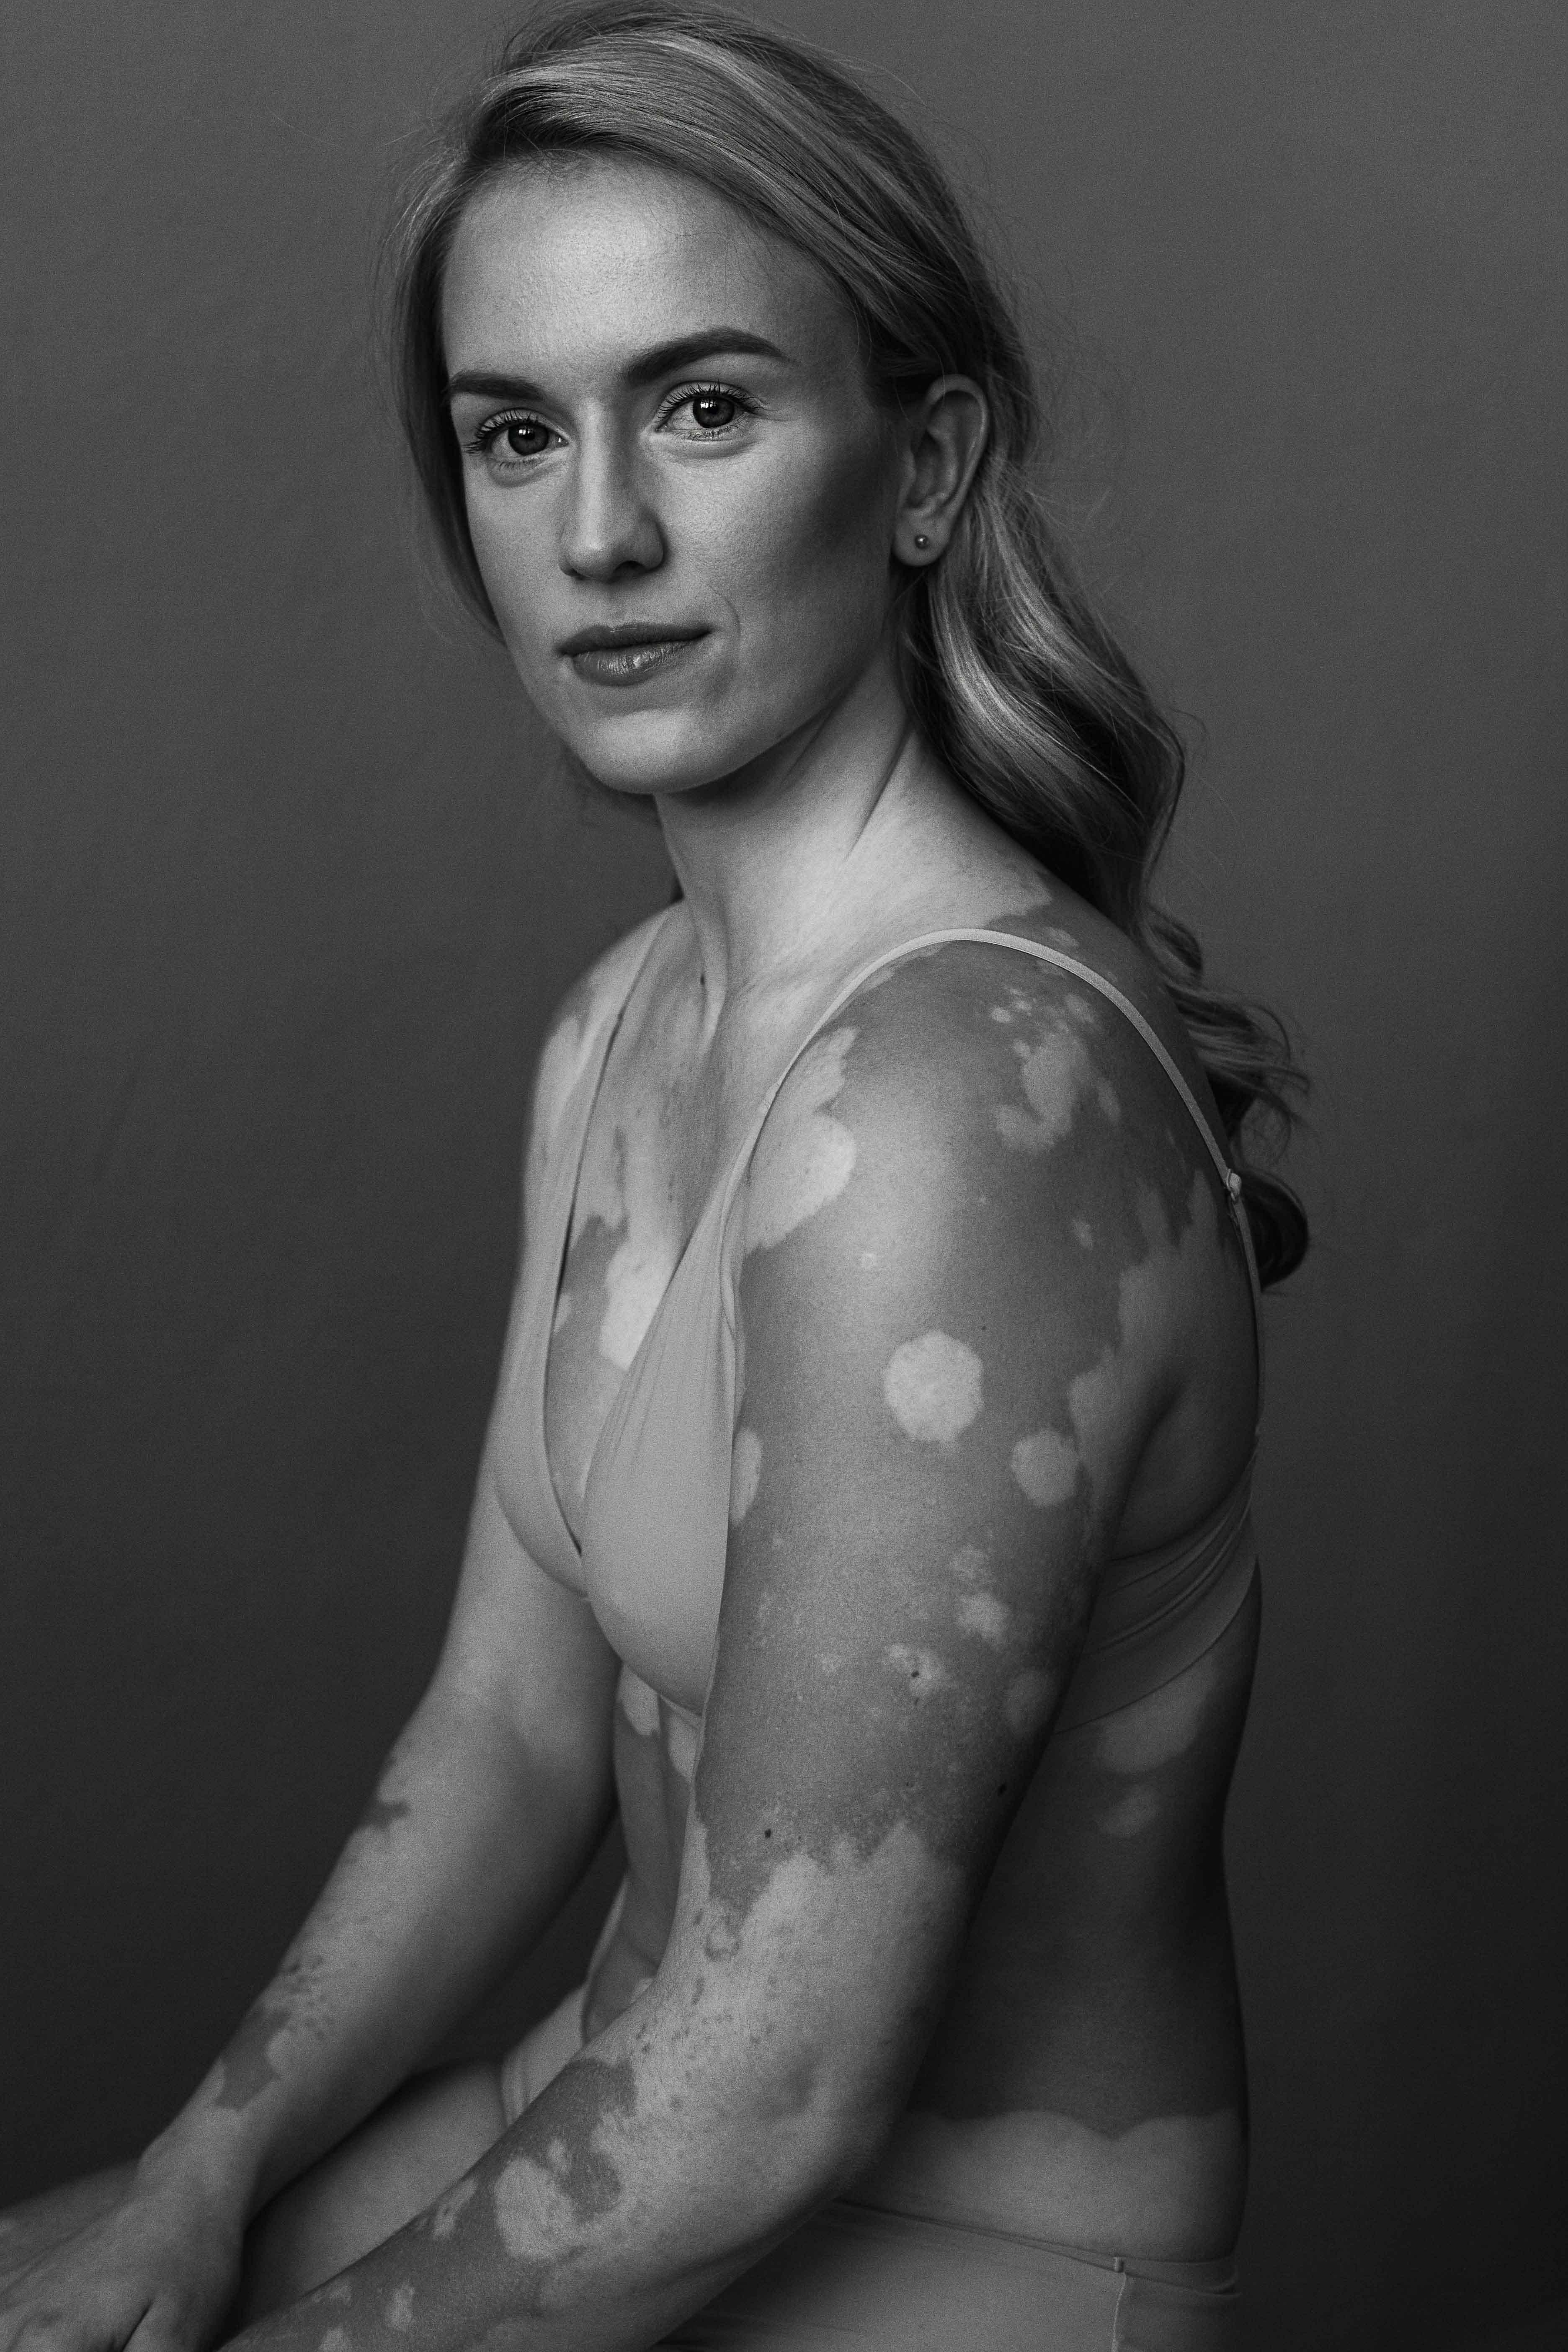 Anna_Elisabeth-van-Aalderen_Vitiligo